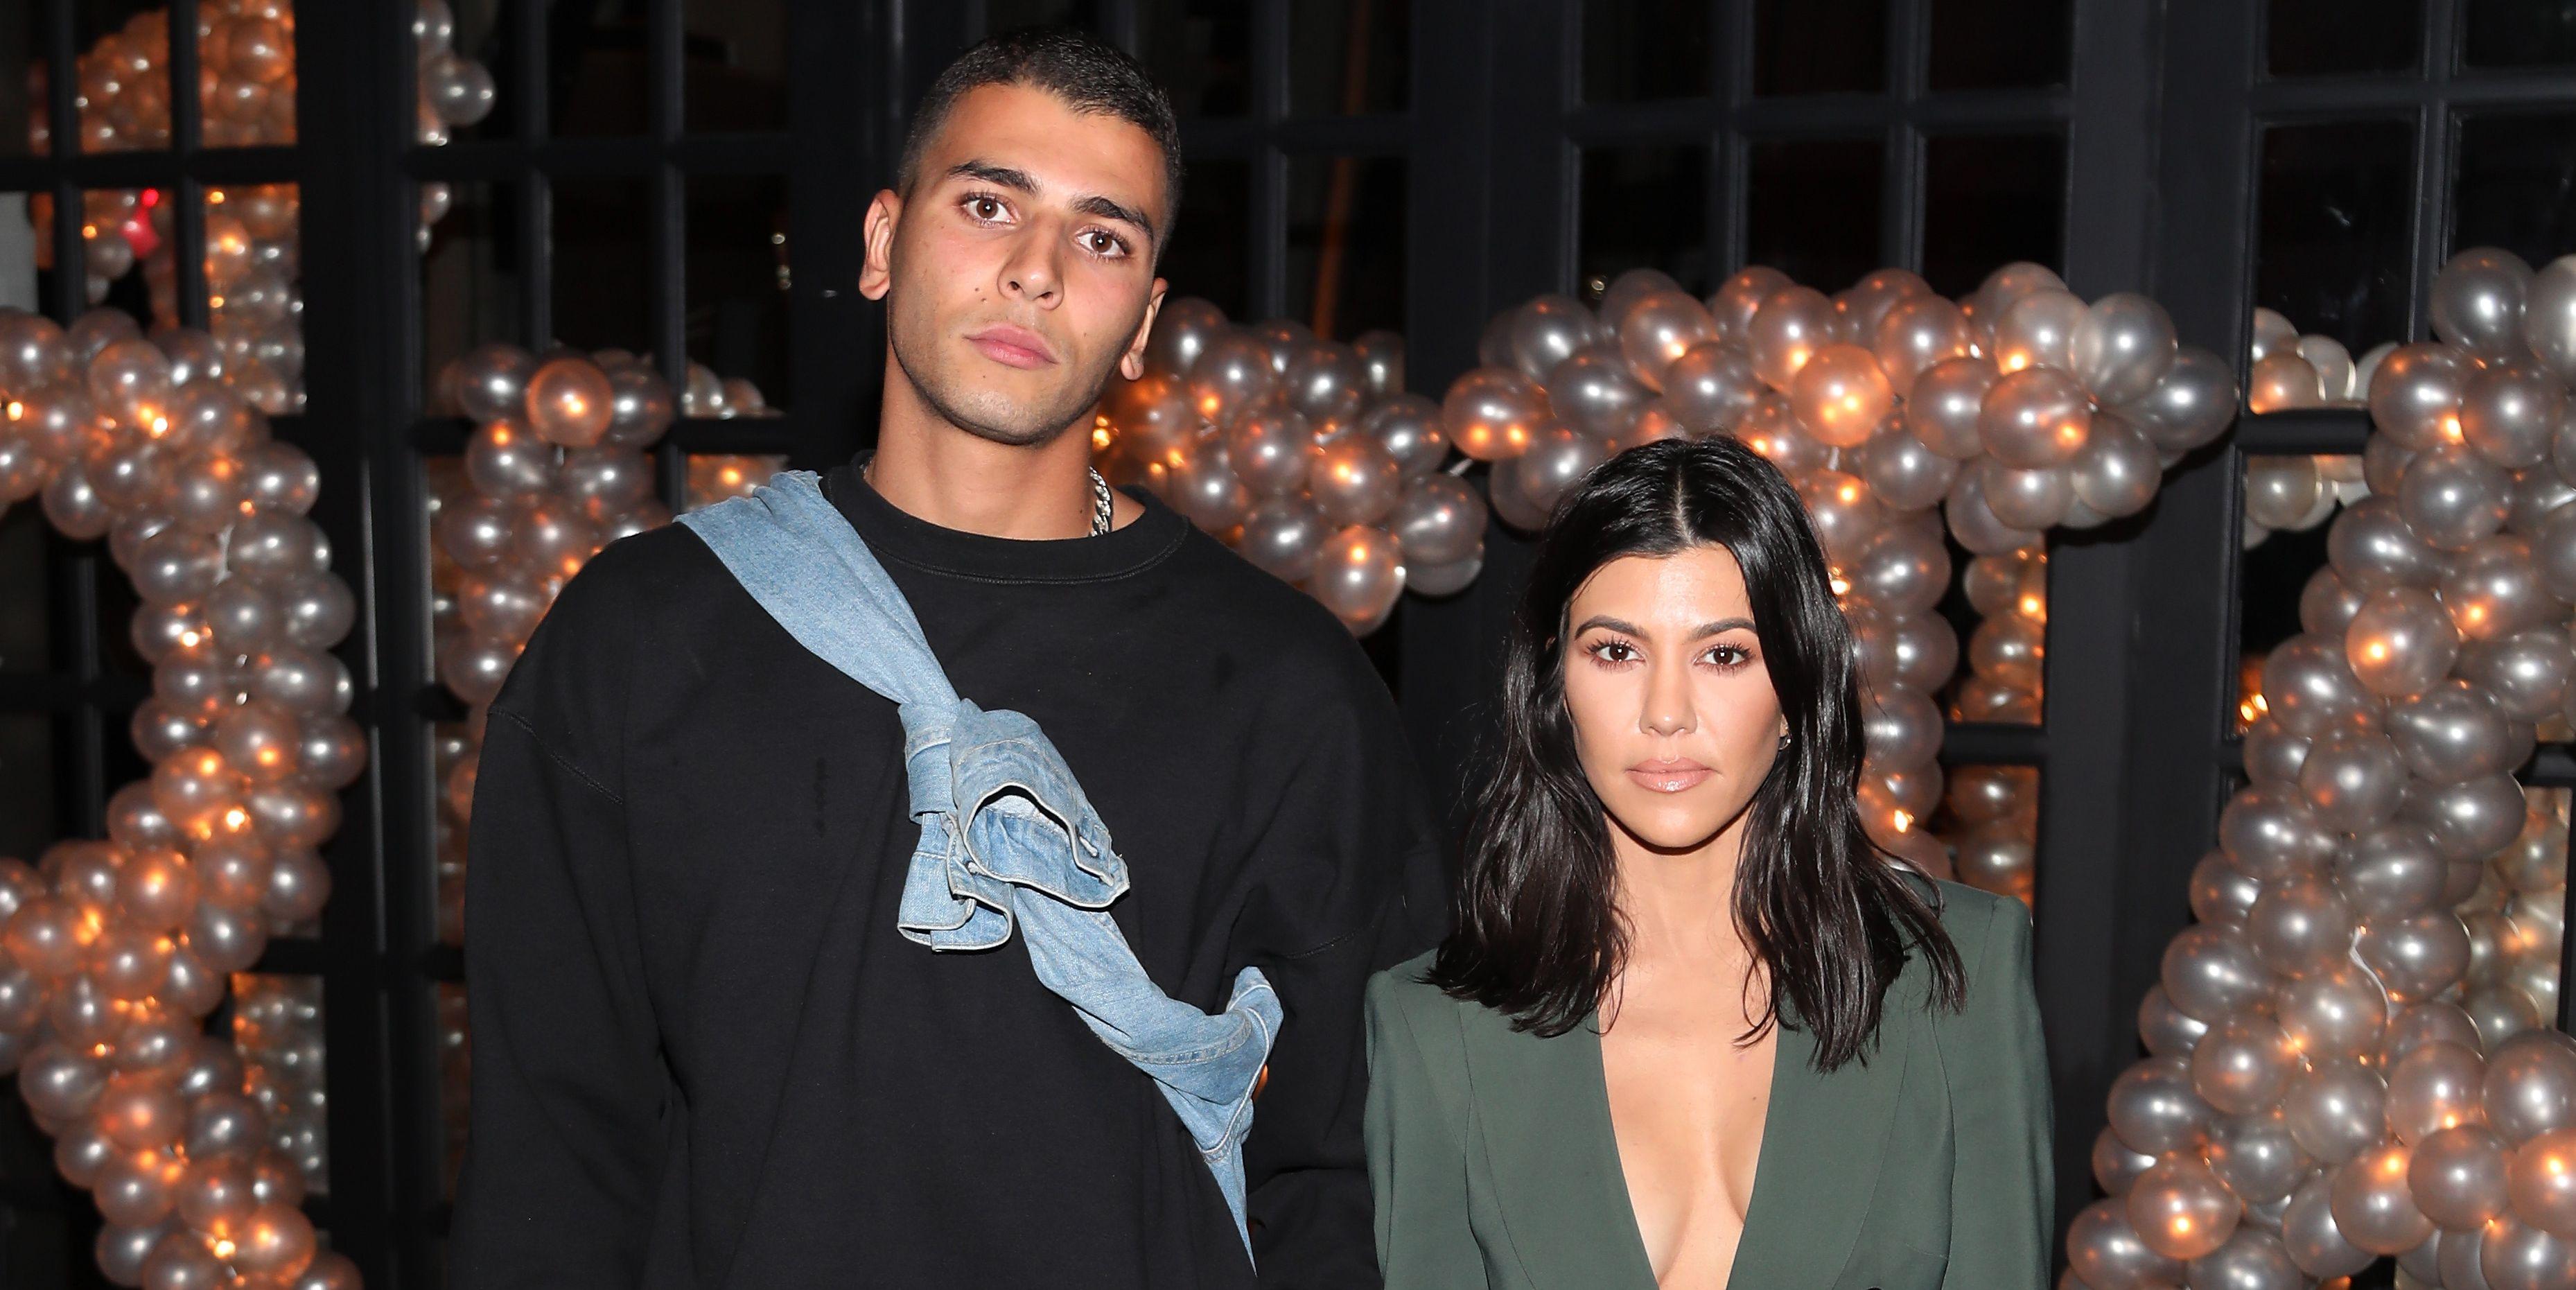 Kourtney Kardashian's Ex-Boyfriend Younes Bendjima Was Fully at Her Birthday Party